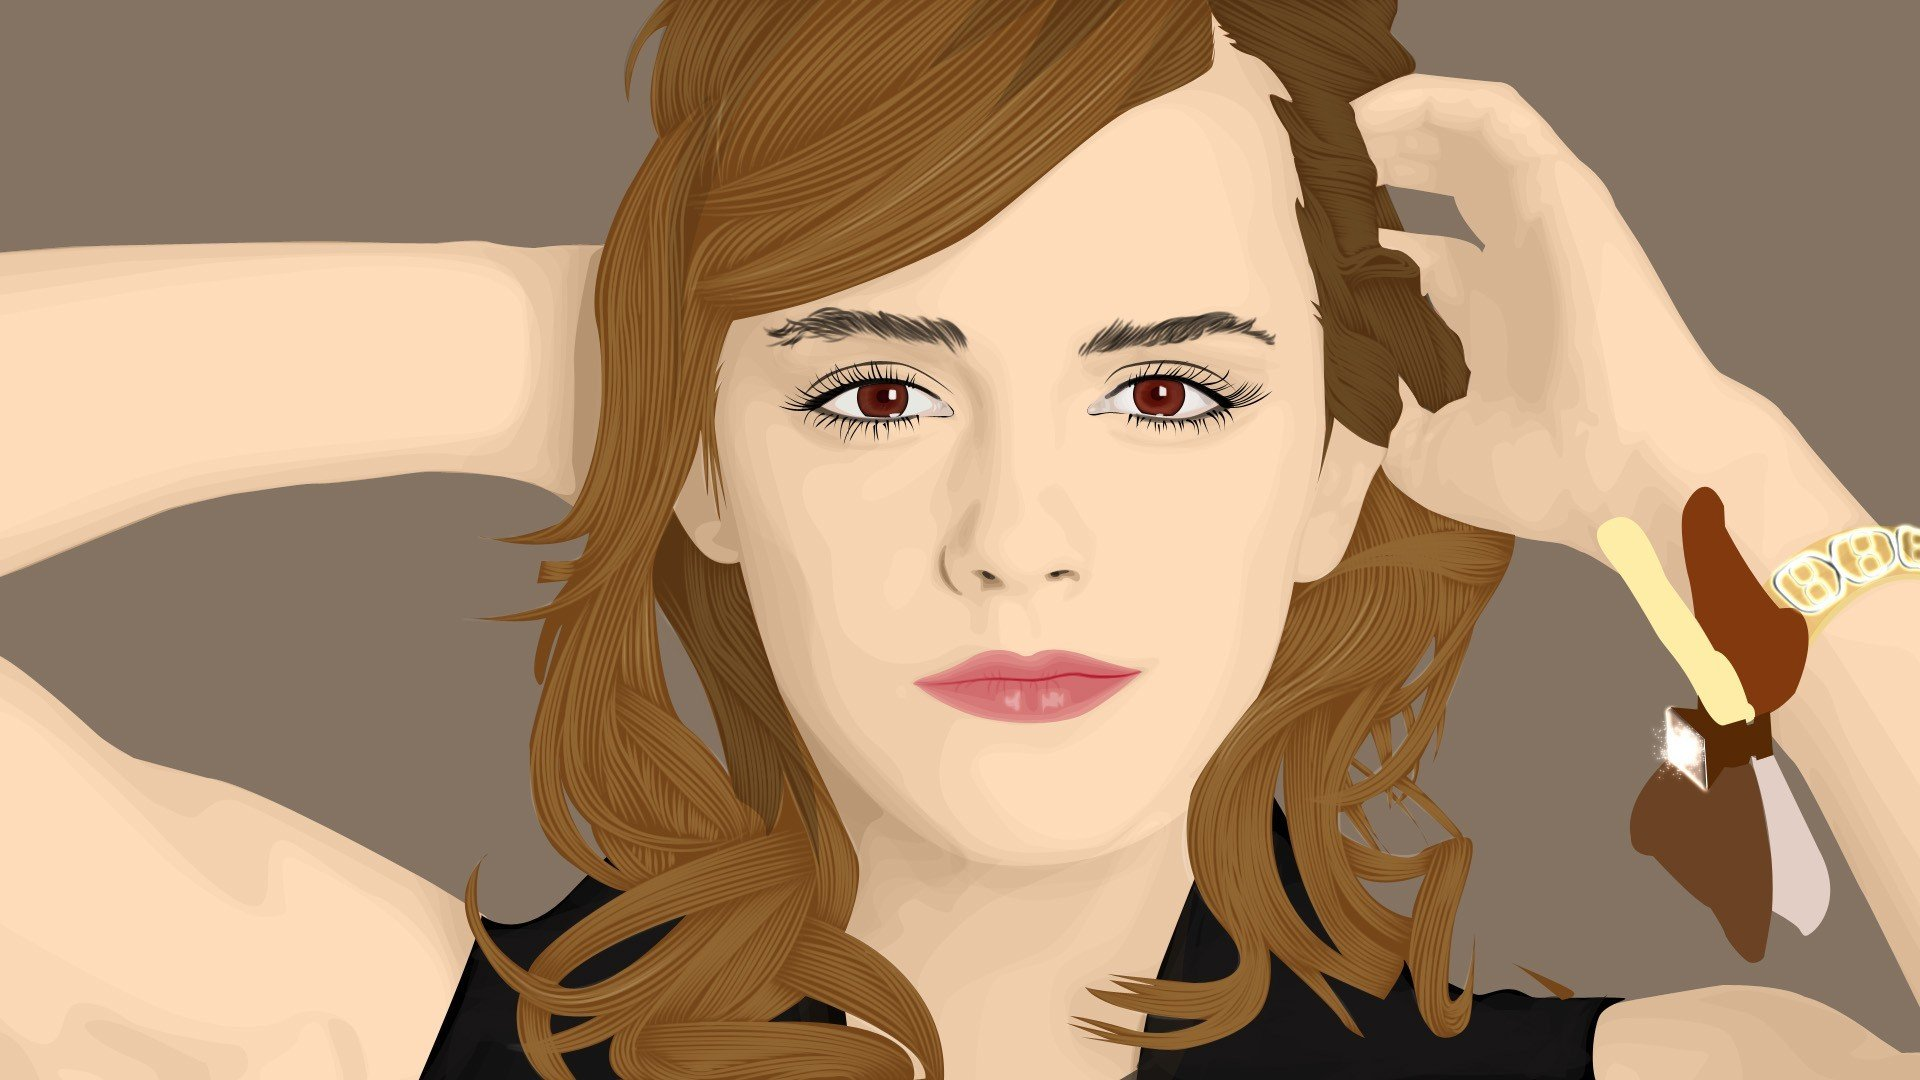 artwork, Emma Watson Wallpaper